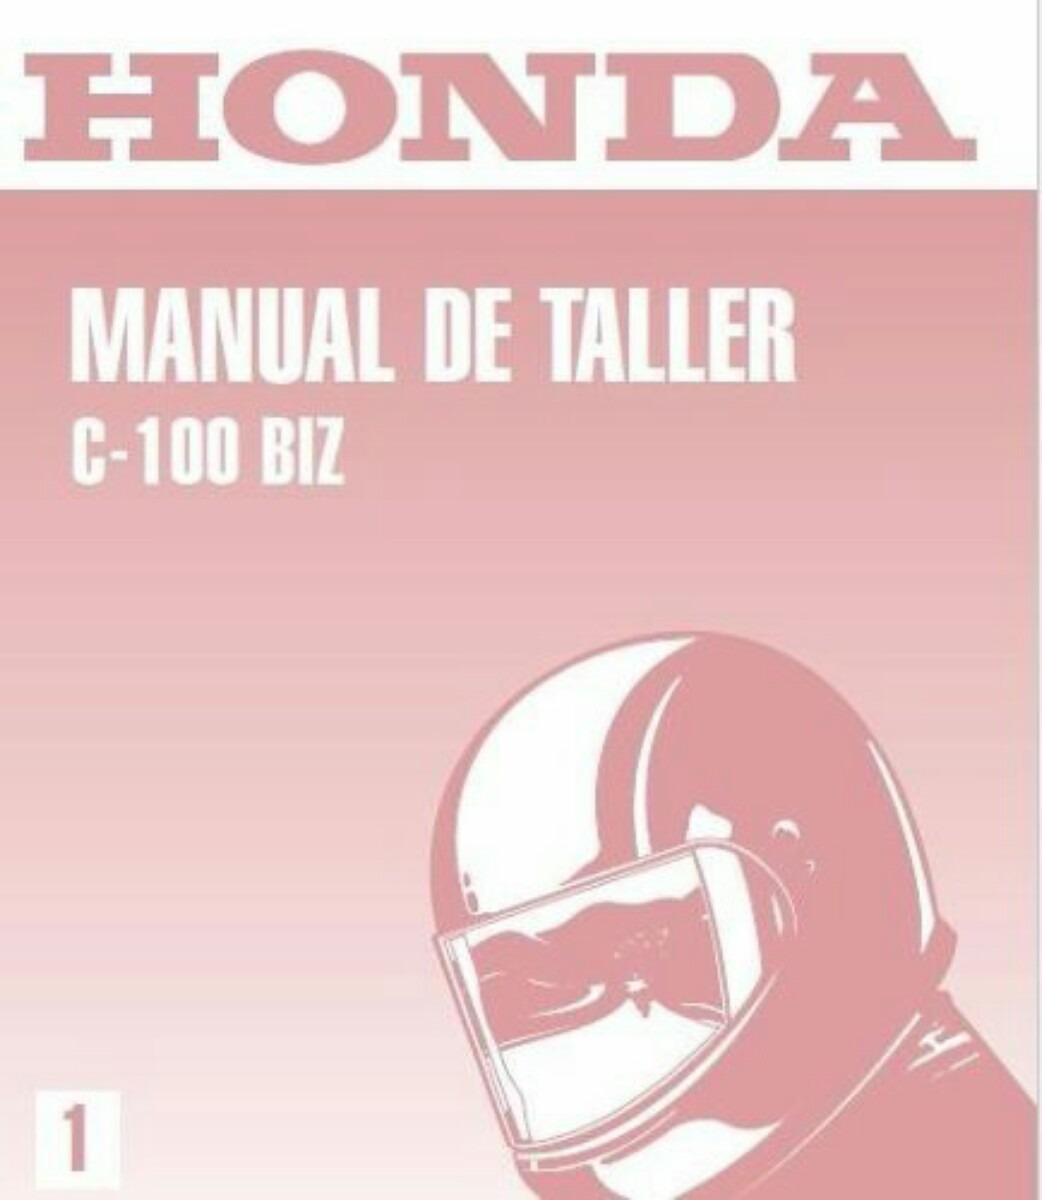 manual taller honda biz 100 smash bit trip corven motome 110 99 rh articulo mercadolibre com ar manual moto honda biz 100 Honda Biz 2004